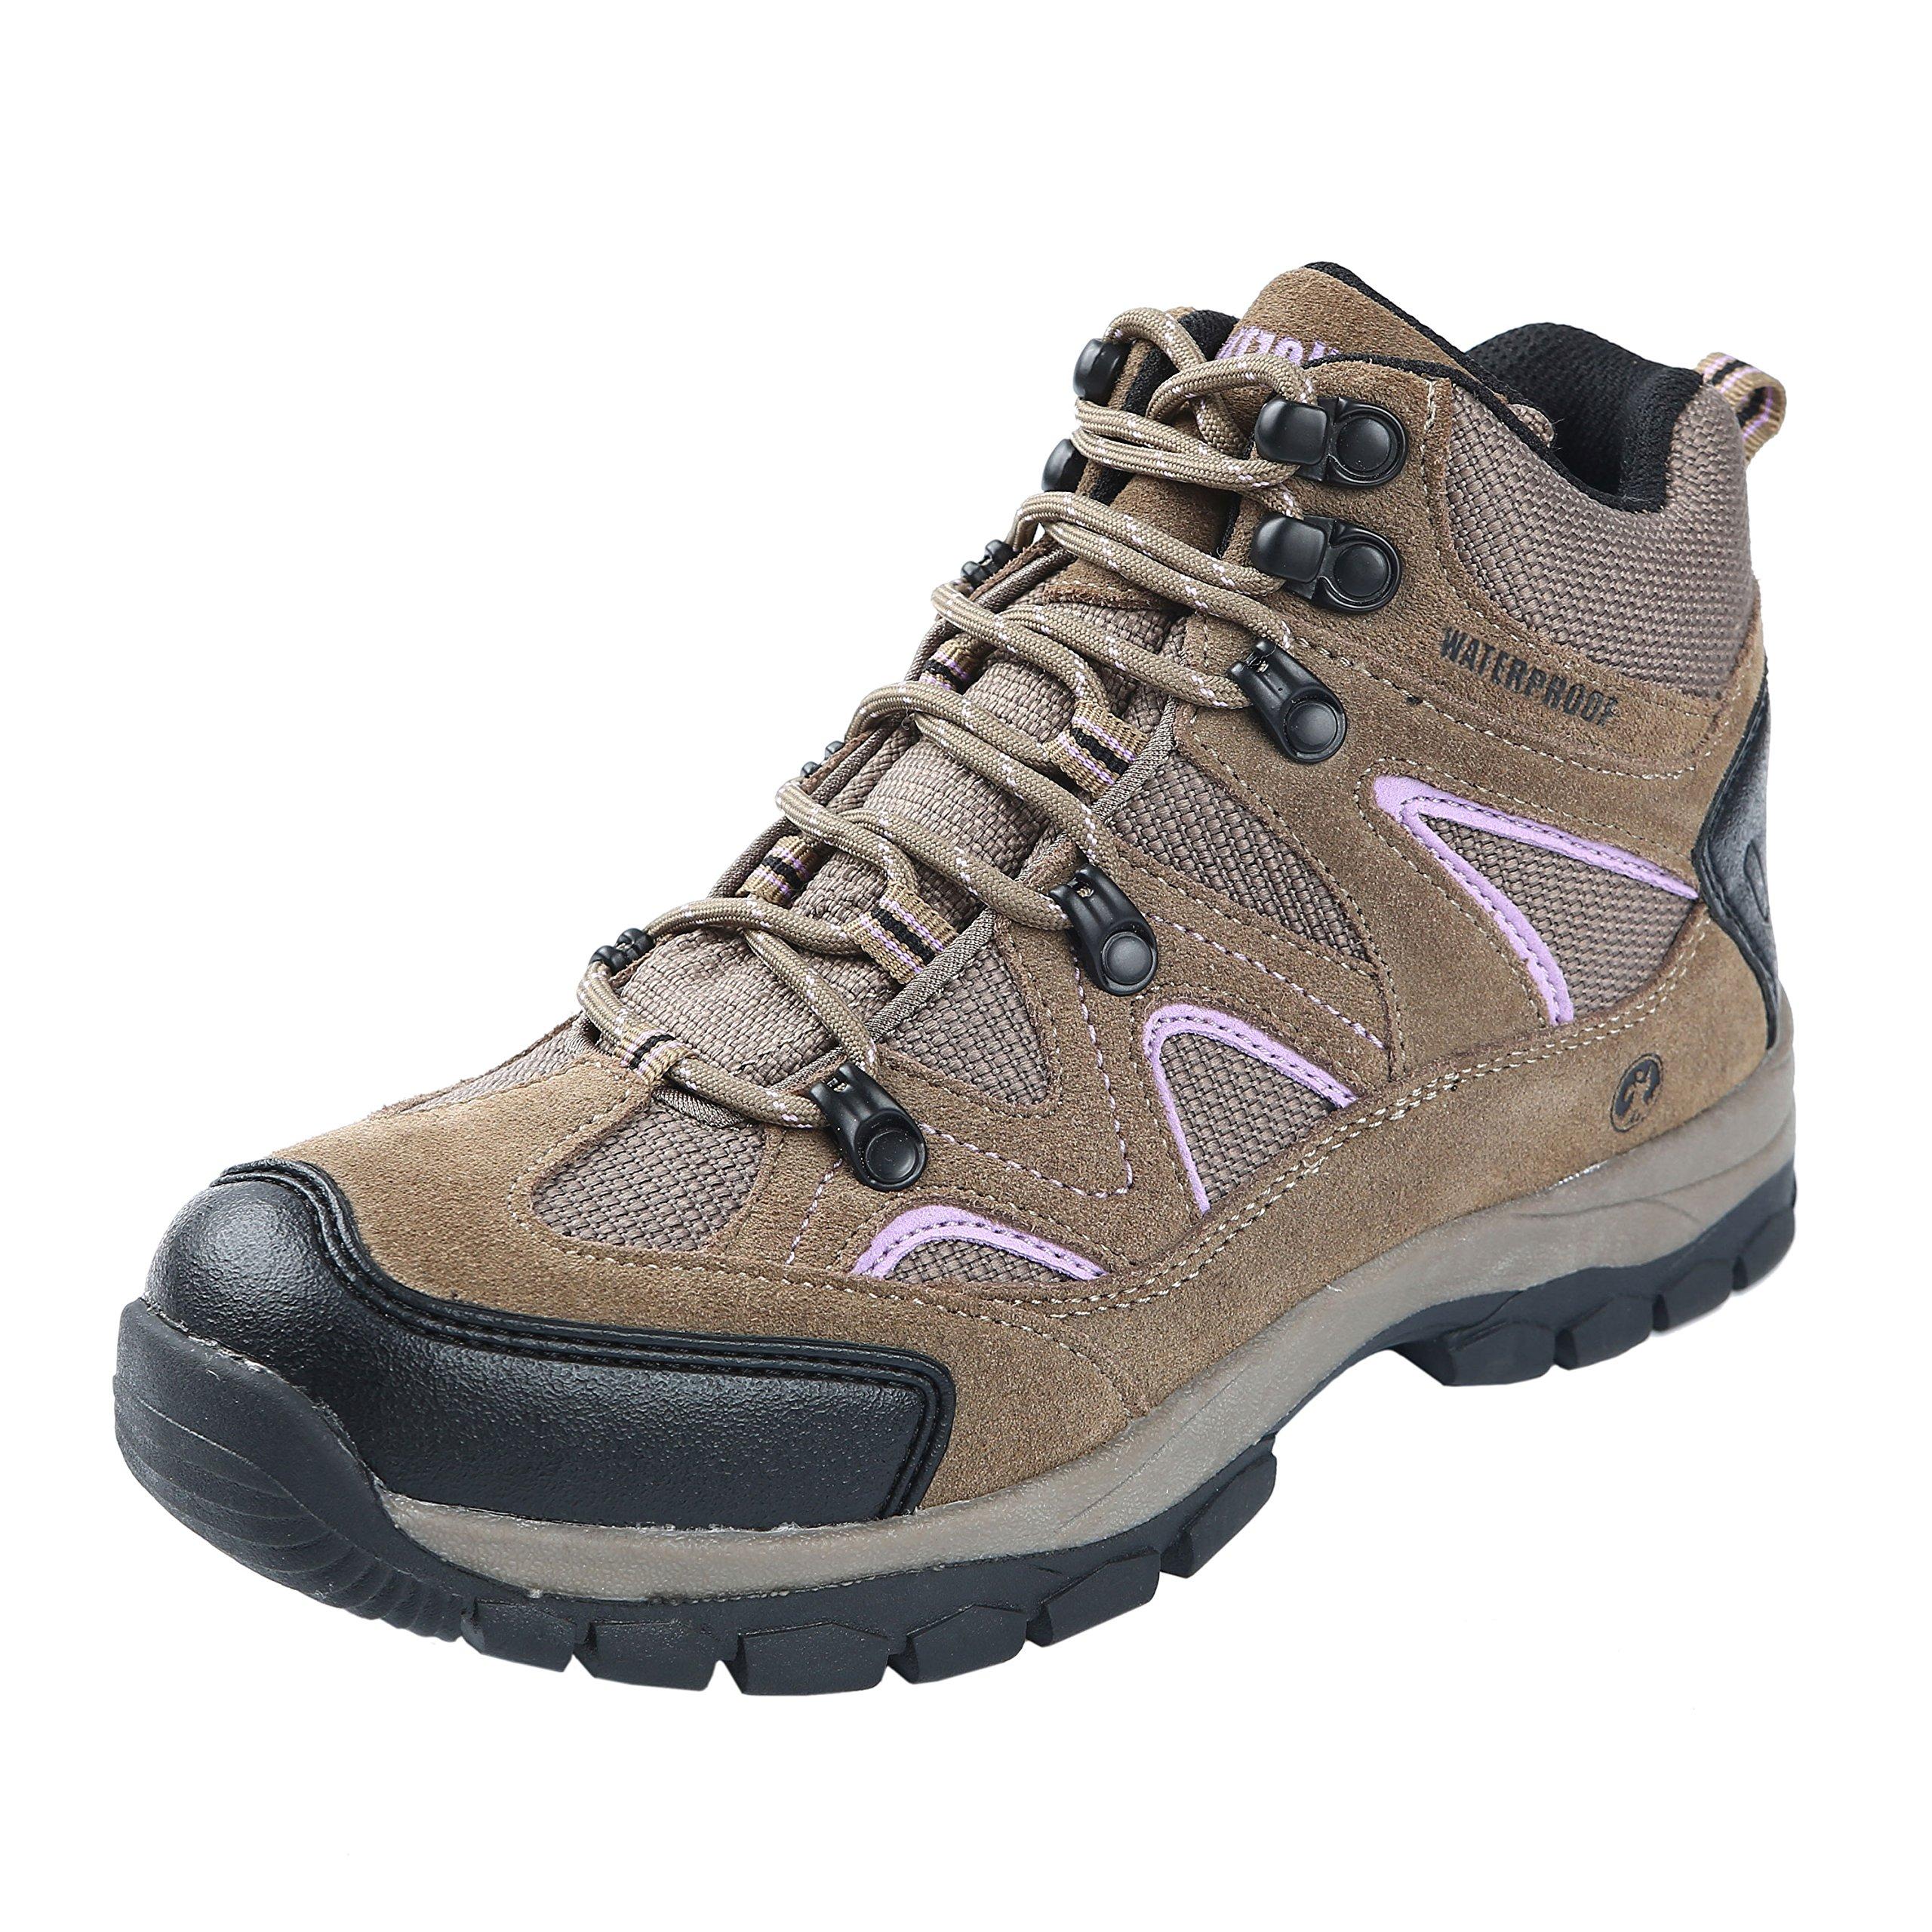 Northside Women's Snohomish Hiking Boot, Tan/Periwinkle, 7 M US